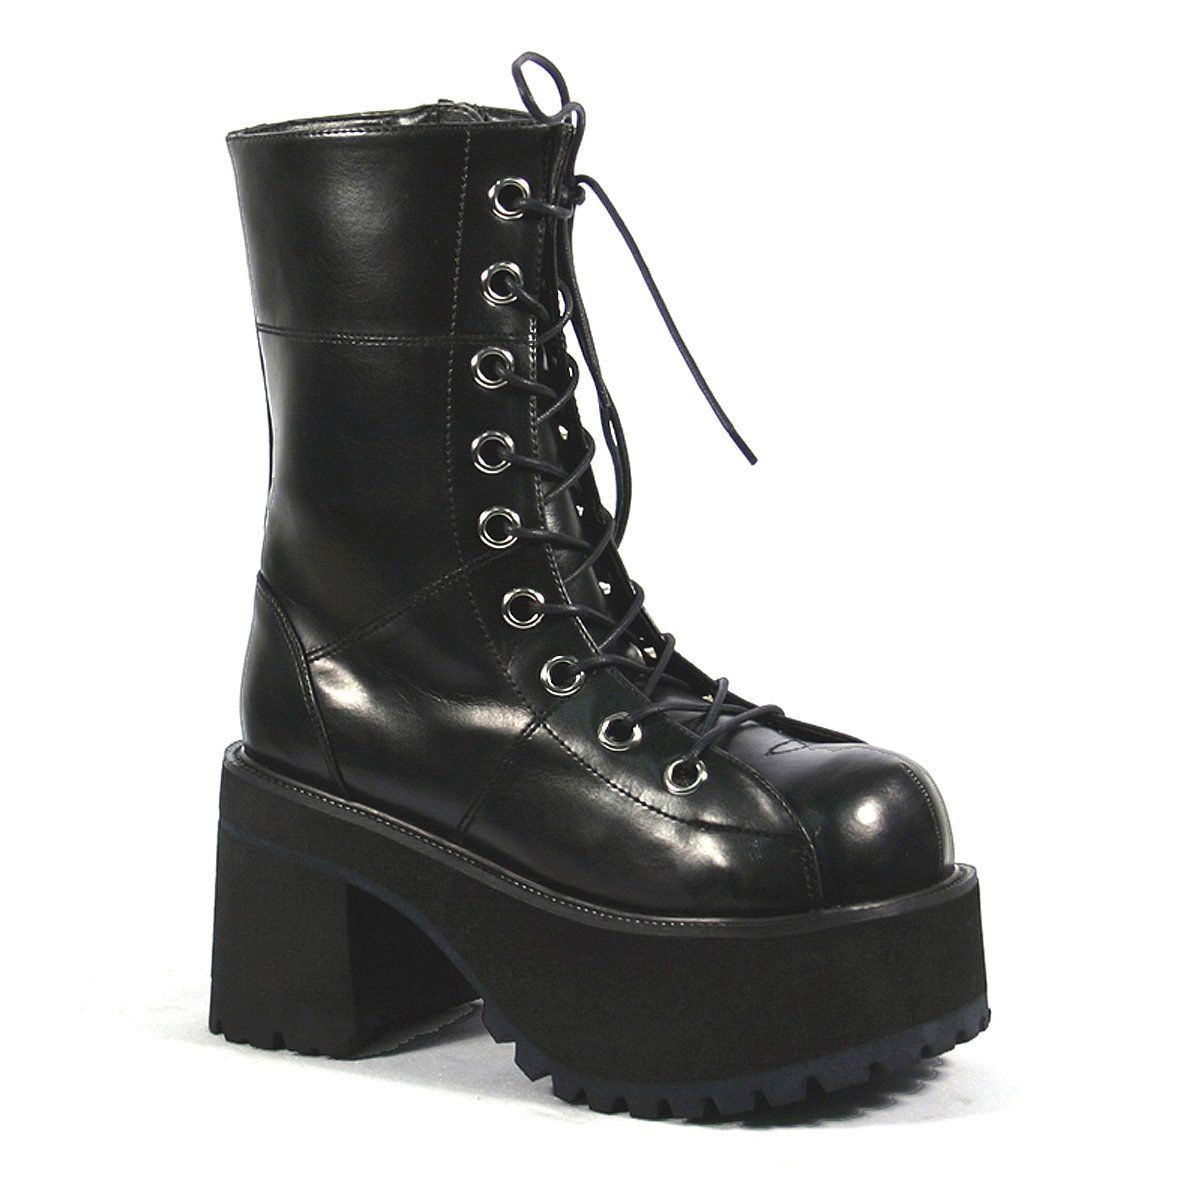 Platform Ankle Boots Black Lace Up